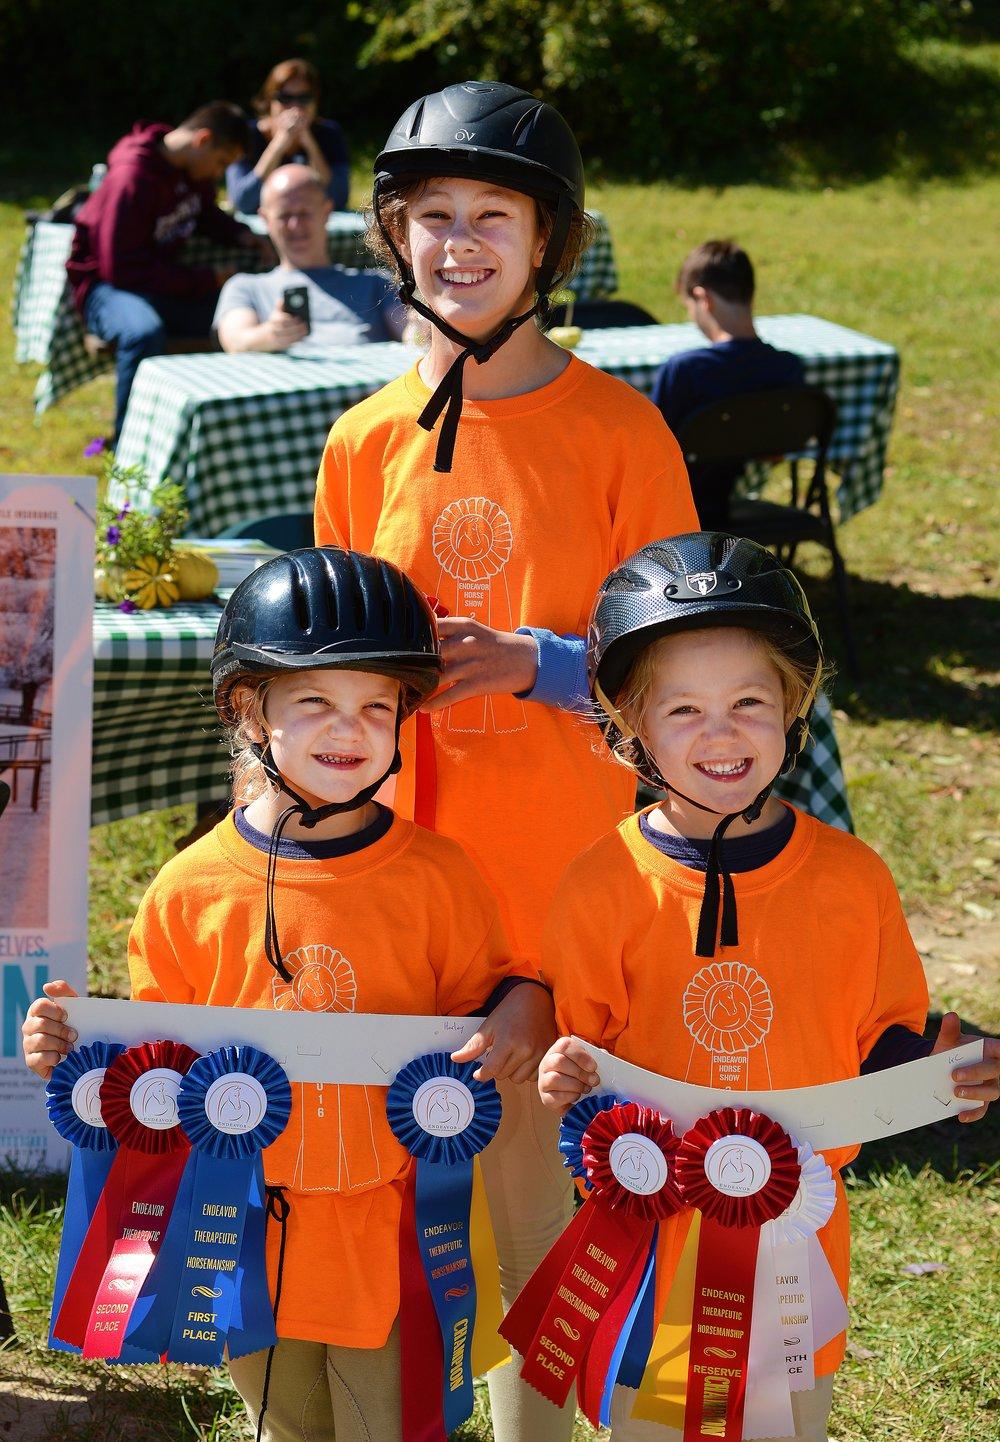 Horse Show_ribbons 1.jpg